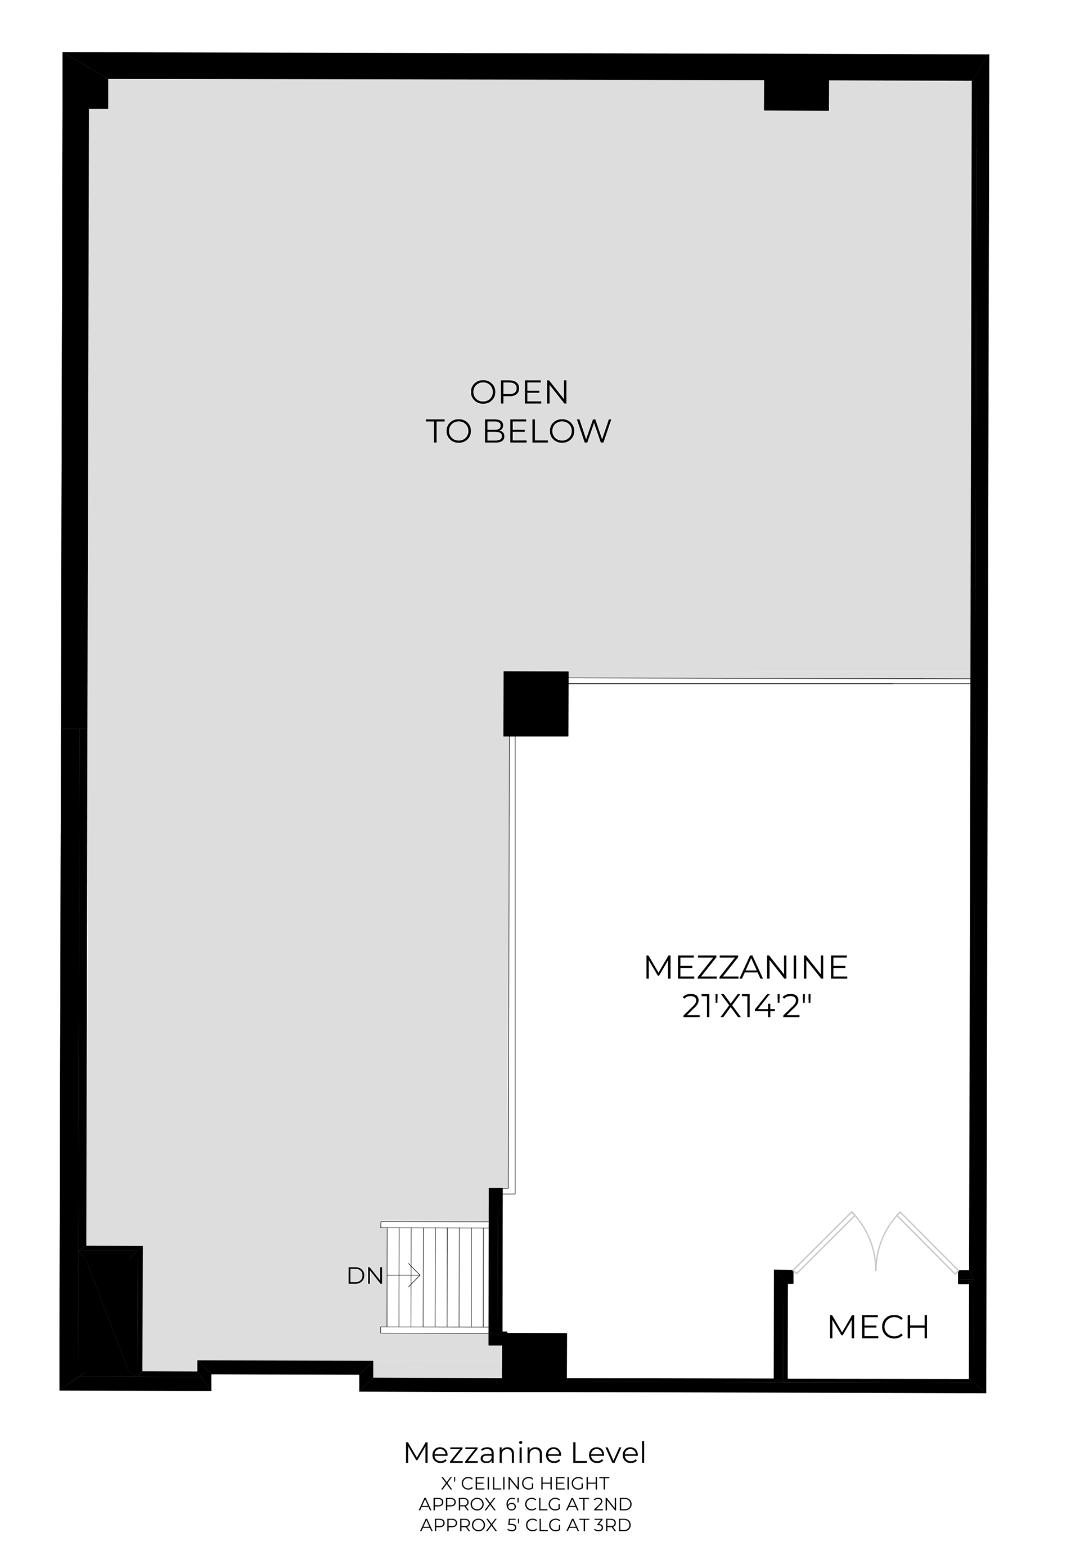 Mezzanine Level Floor Plan